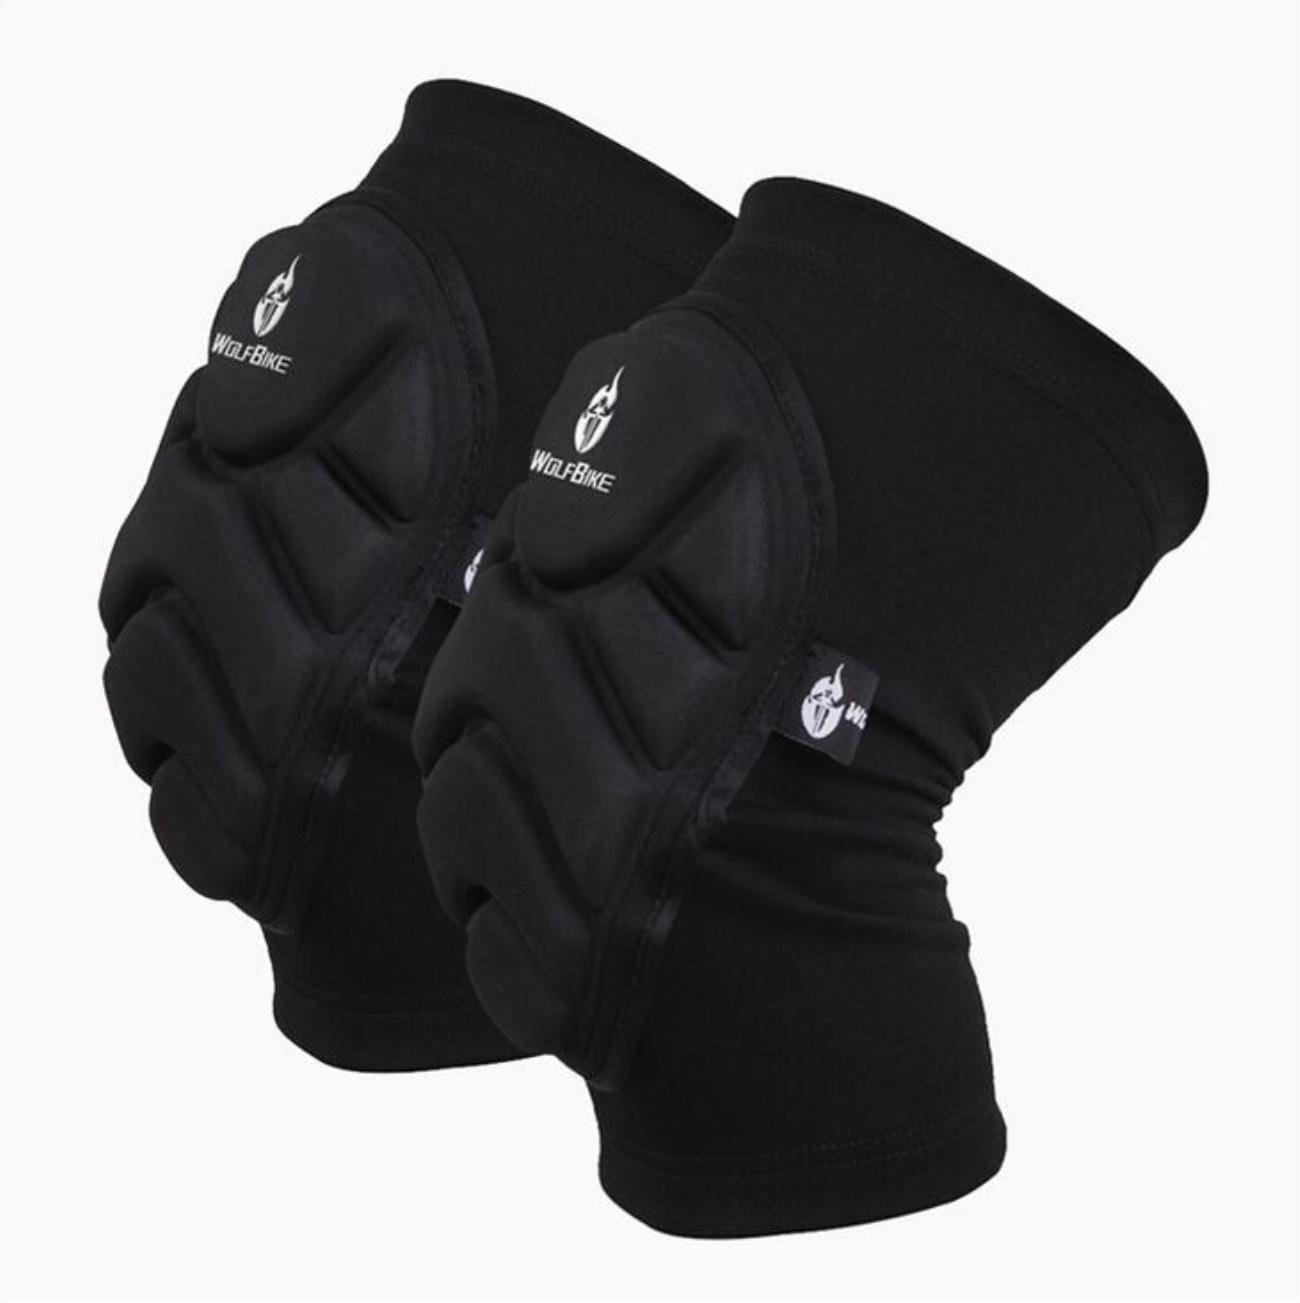 WOSAWE Rolling kneepad downhill movement padded compression leg sleeve